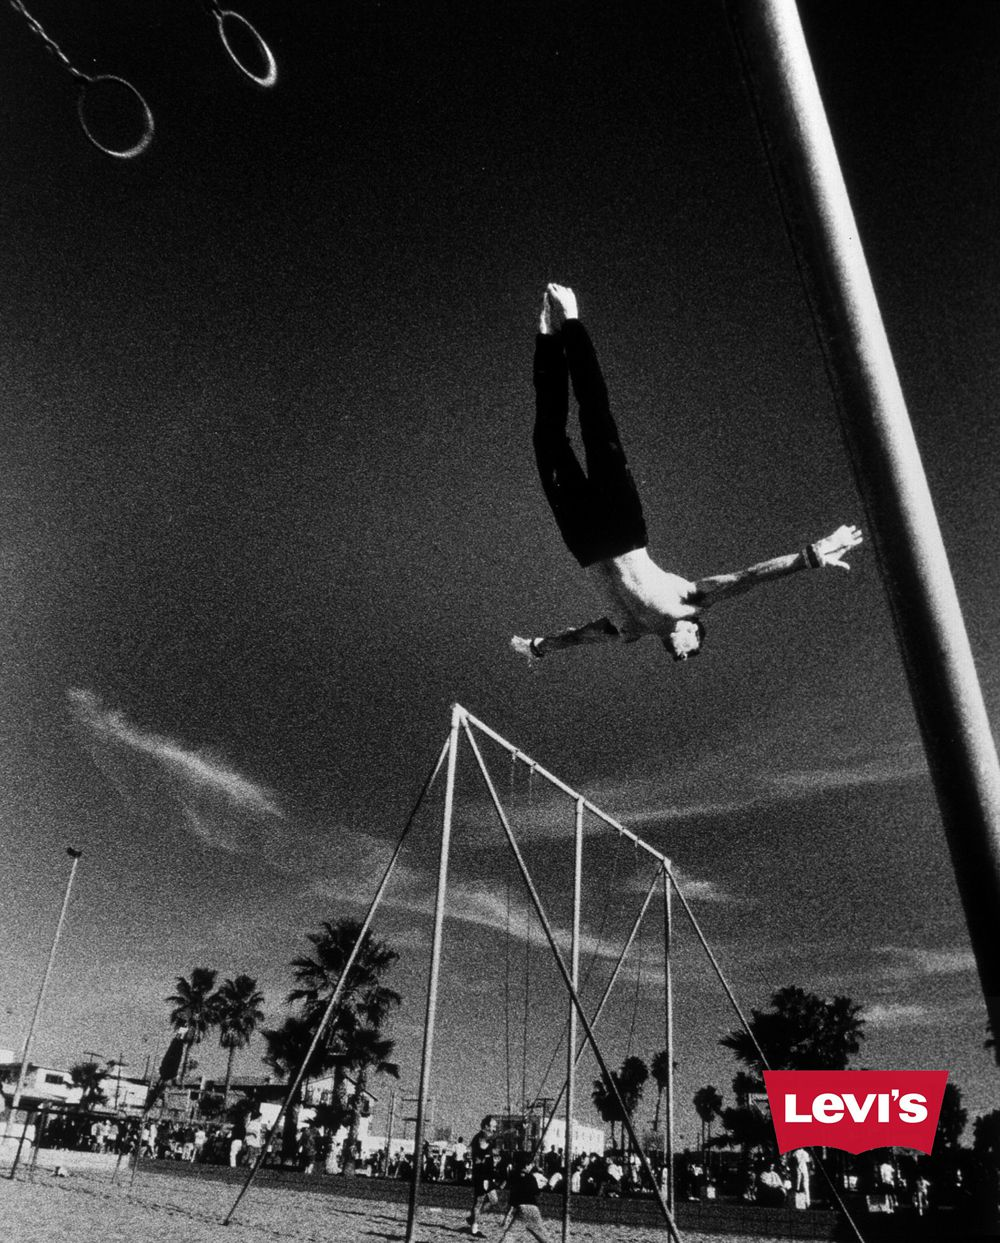 Levis_Jump_2_Shaun Pettigrew.jpg